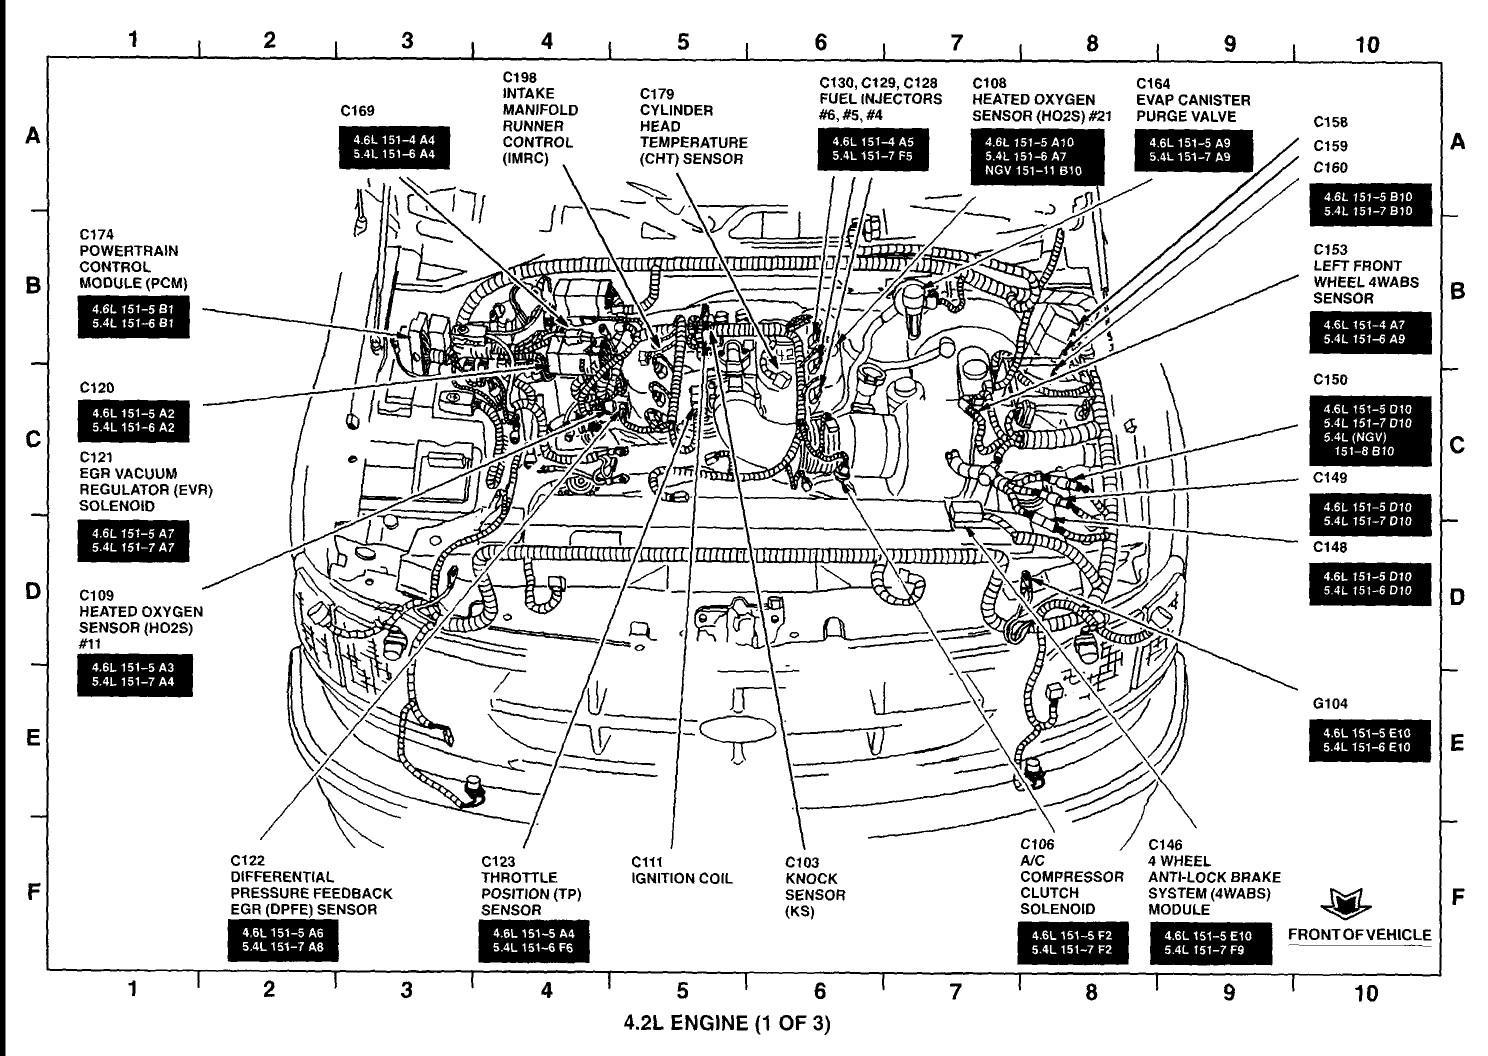 So Ford F 150 Parts Diagram Wiring Diagram